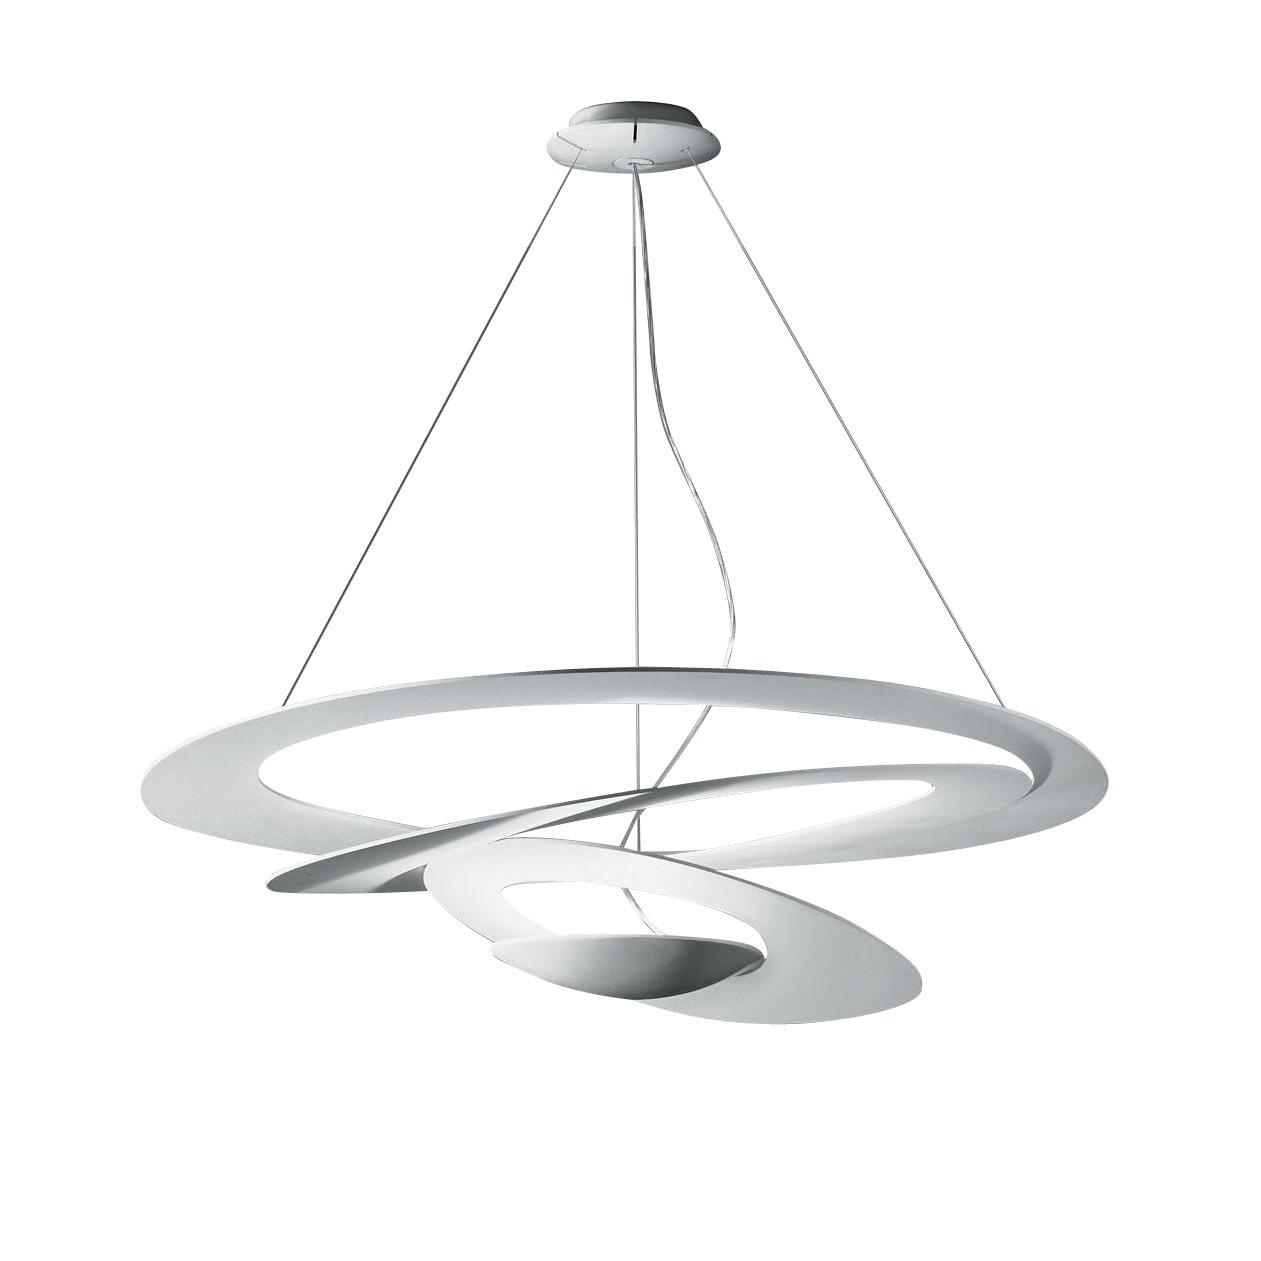 Artemide Pirce LED Suspension Lamp   AmbienteDirect